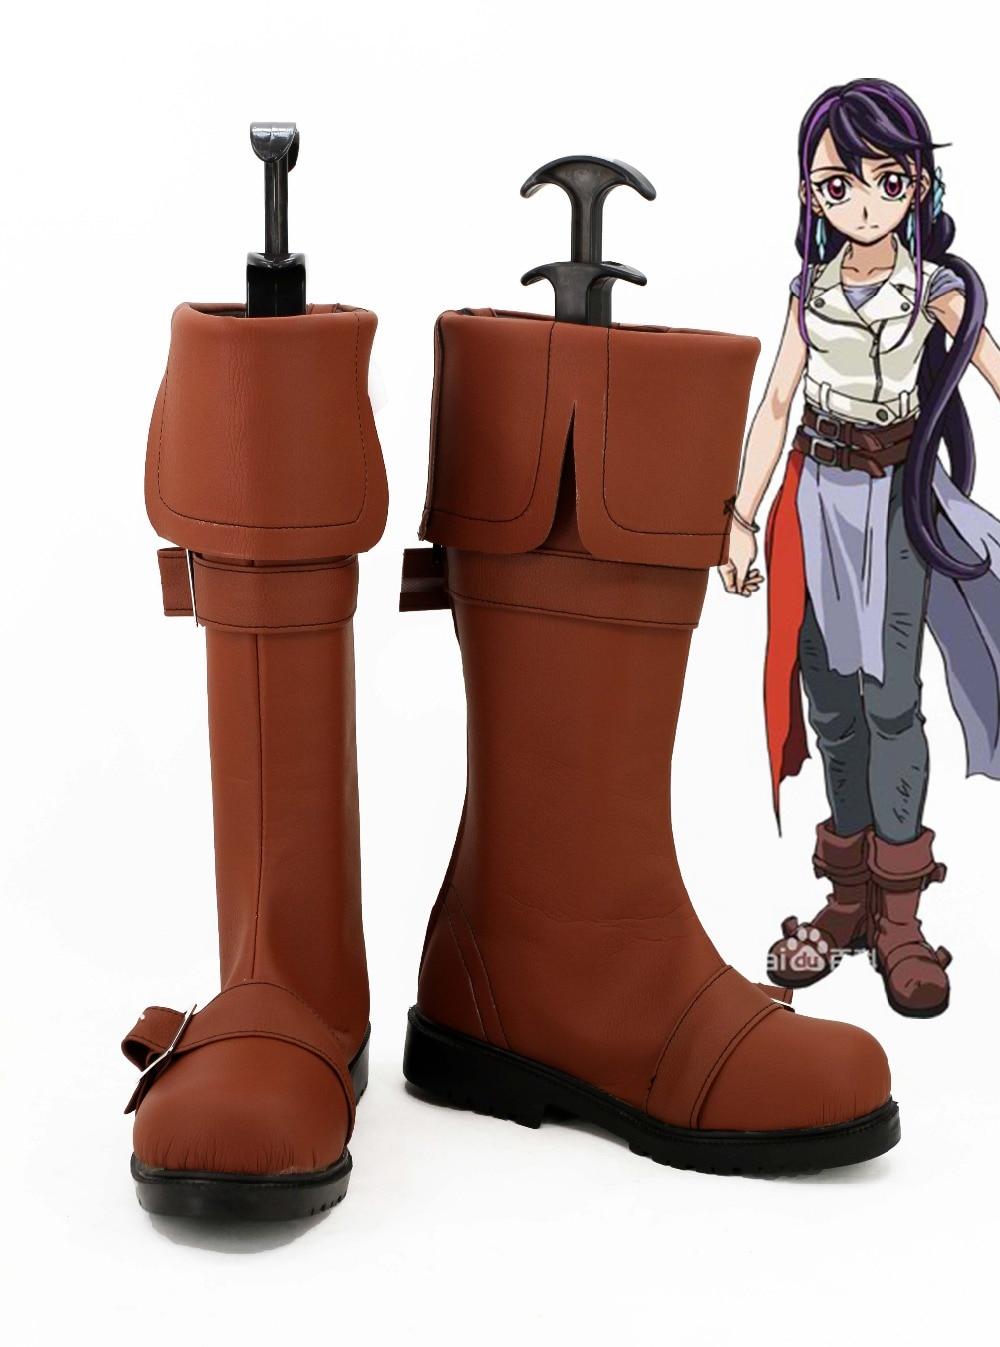 ARC-V Yu-gi-oh! Kurosaki Ruri Cosplay bottes Lulu obsidienne Anime chaussures sur mesure